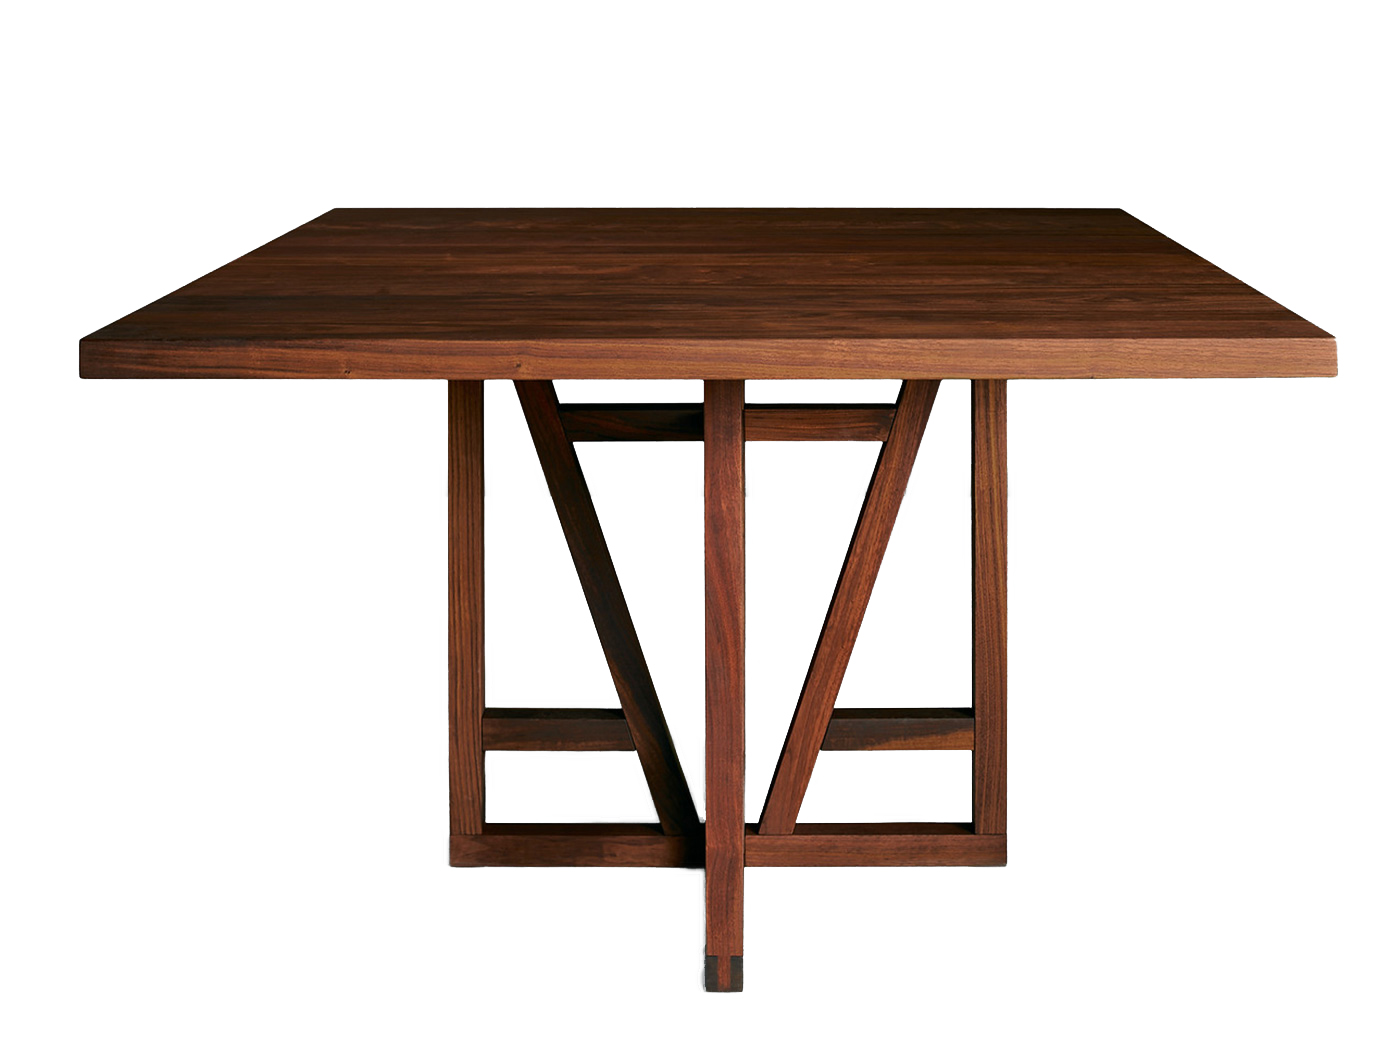 Leipzig - Vierkante tafel